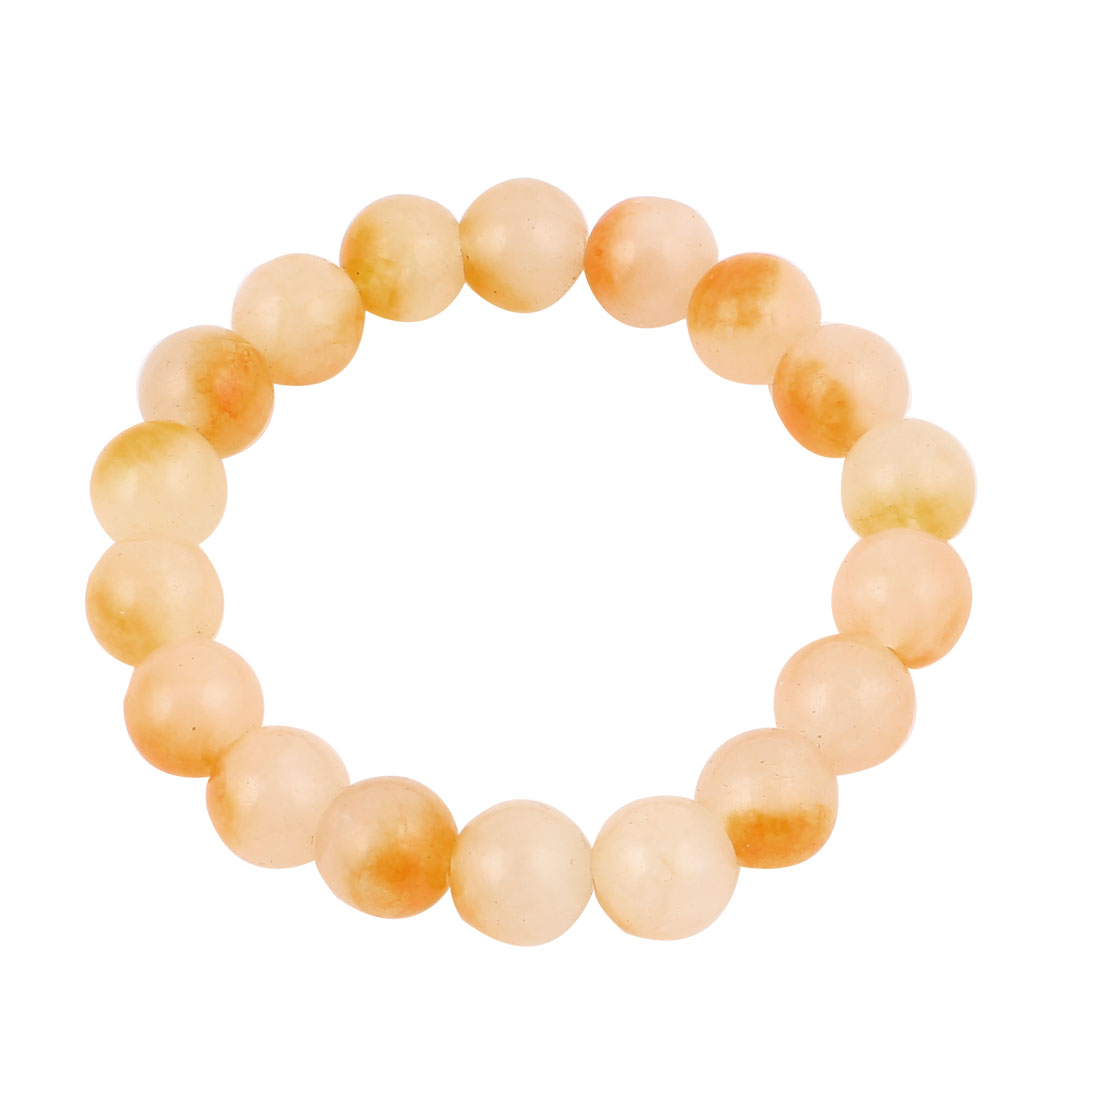 Lady Jewelry Round Faux Jade Beads Decor Elastic Wrist Bangle Bracelet Yellow